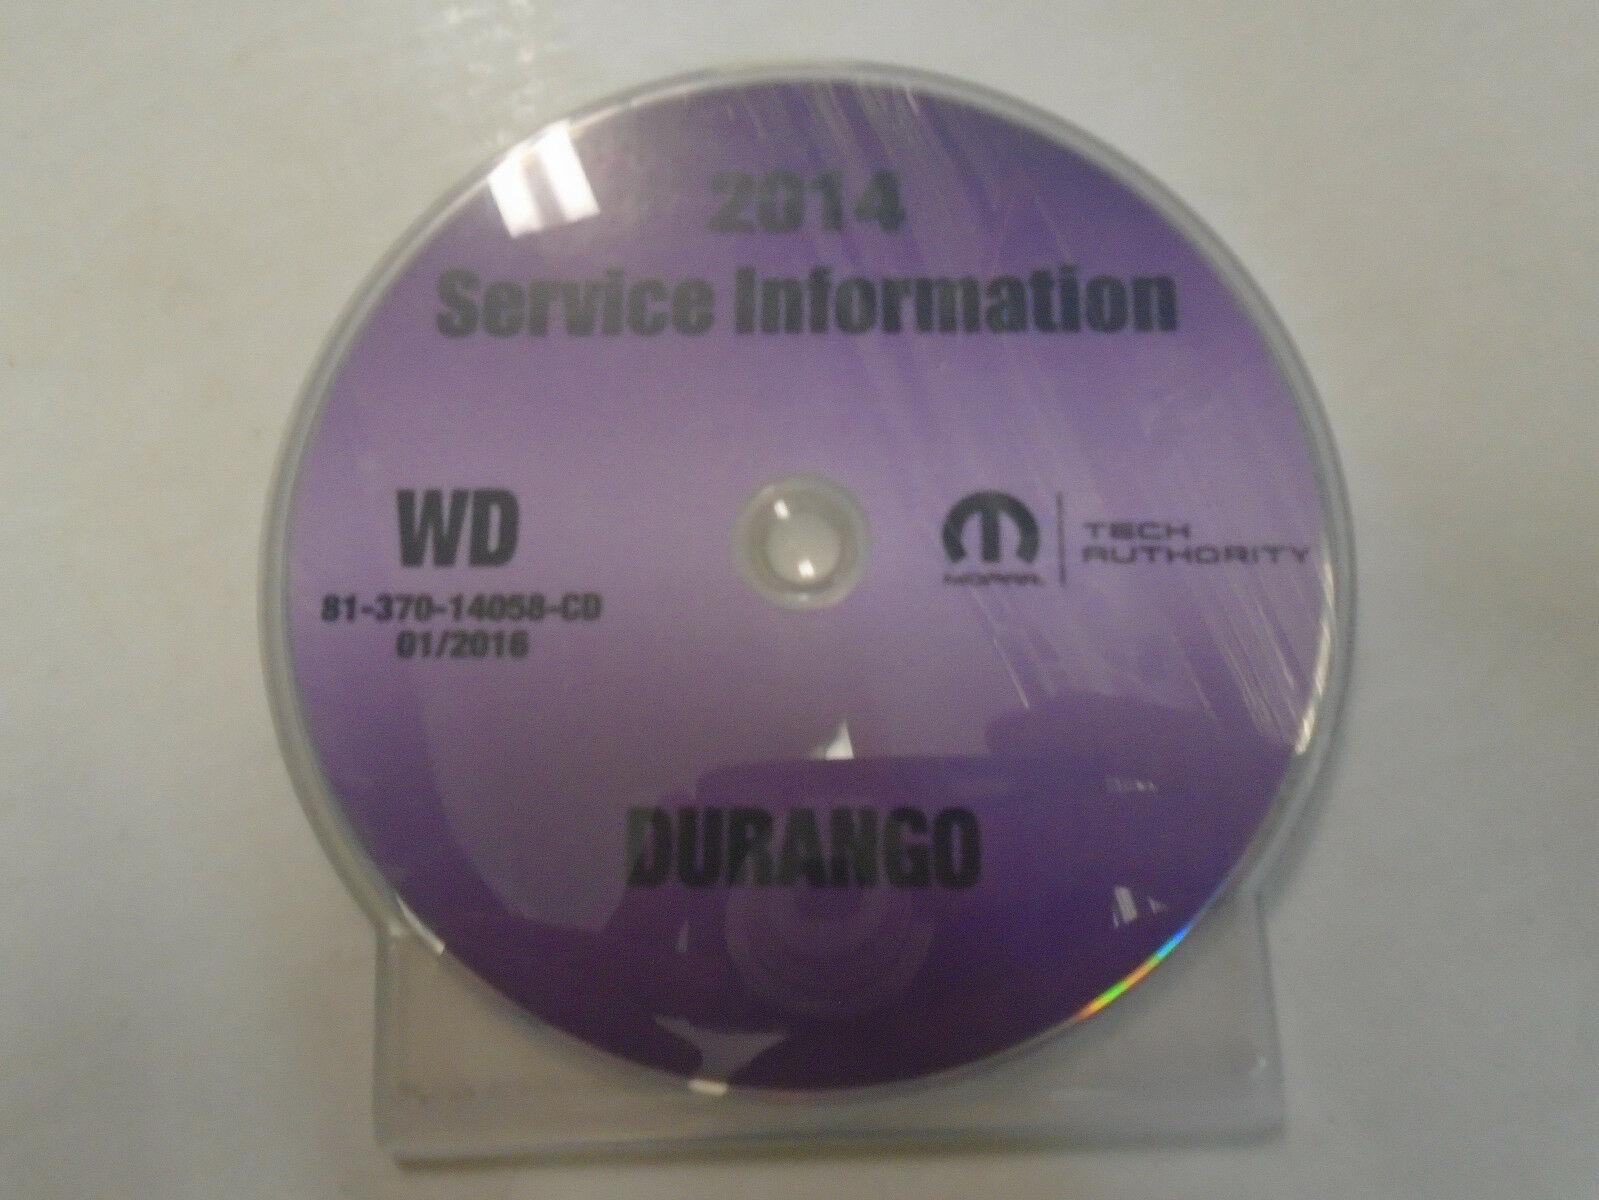 2014 DODGE DURANGO Service INFORMATION Repair Shop Workshop Manual CD NEW